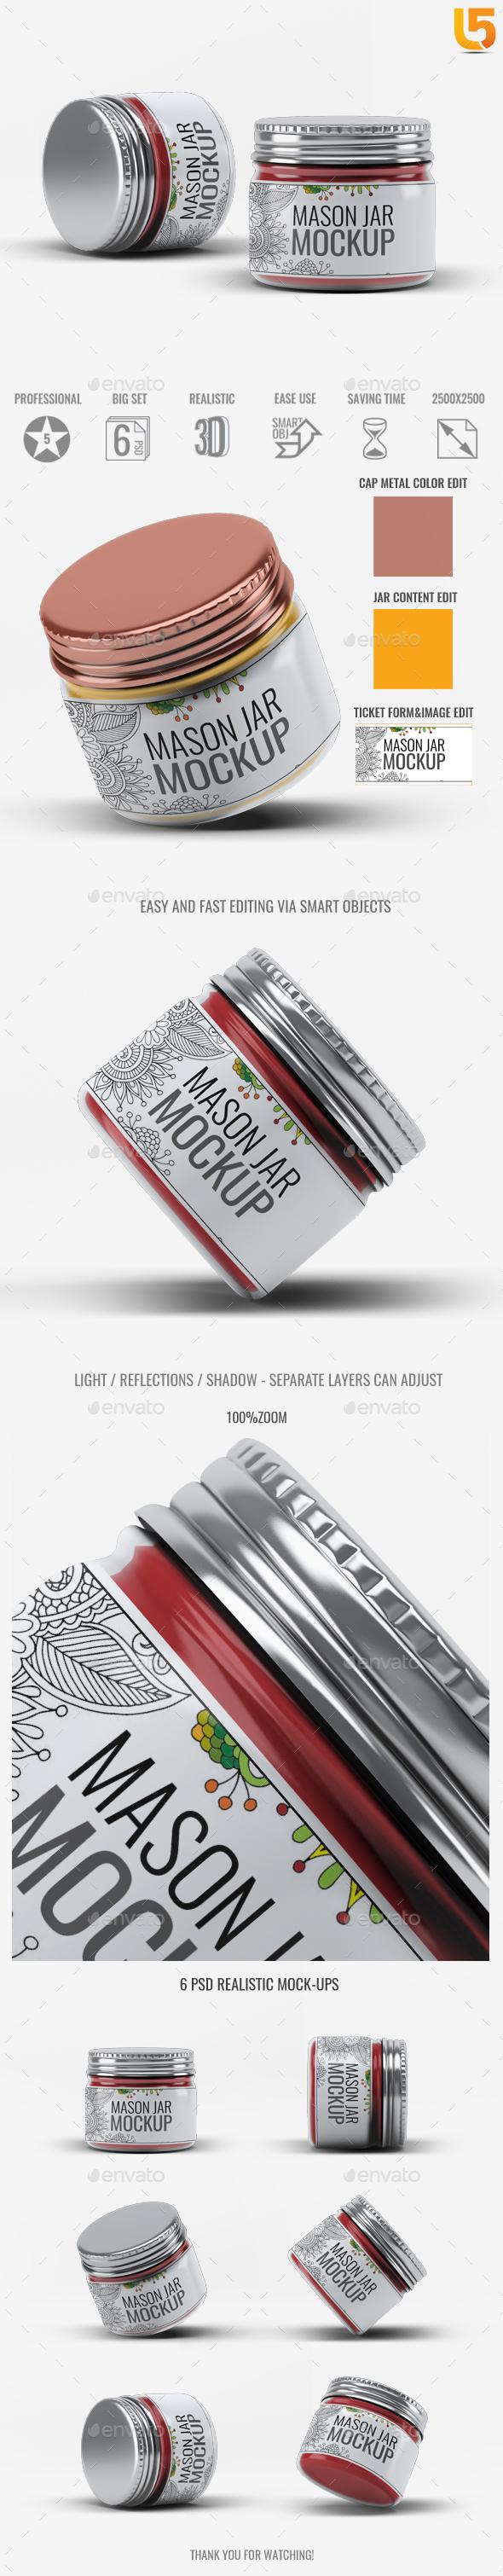 Mason Jar Mock-Up V.3 - Food and Drink Packaging